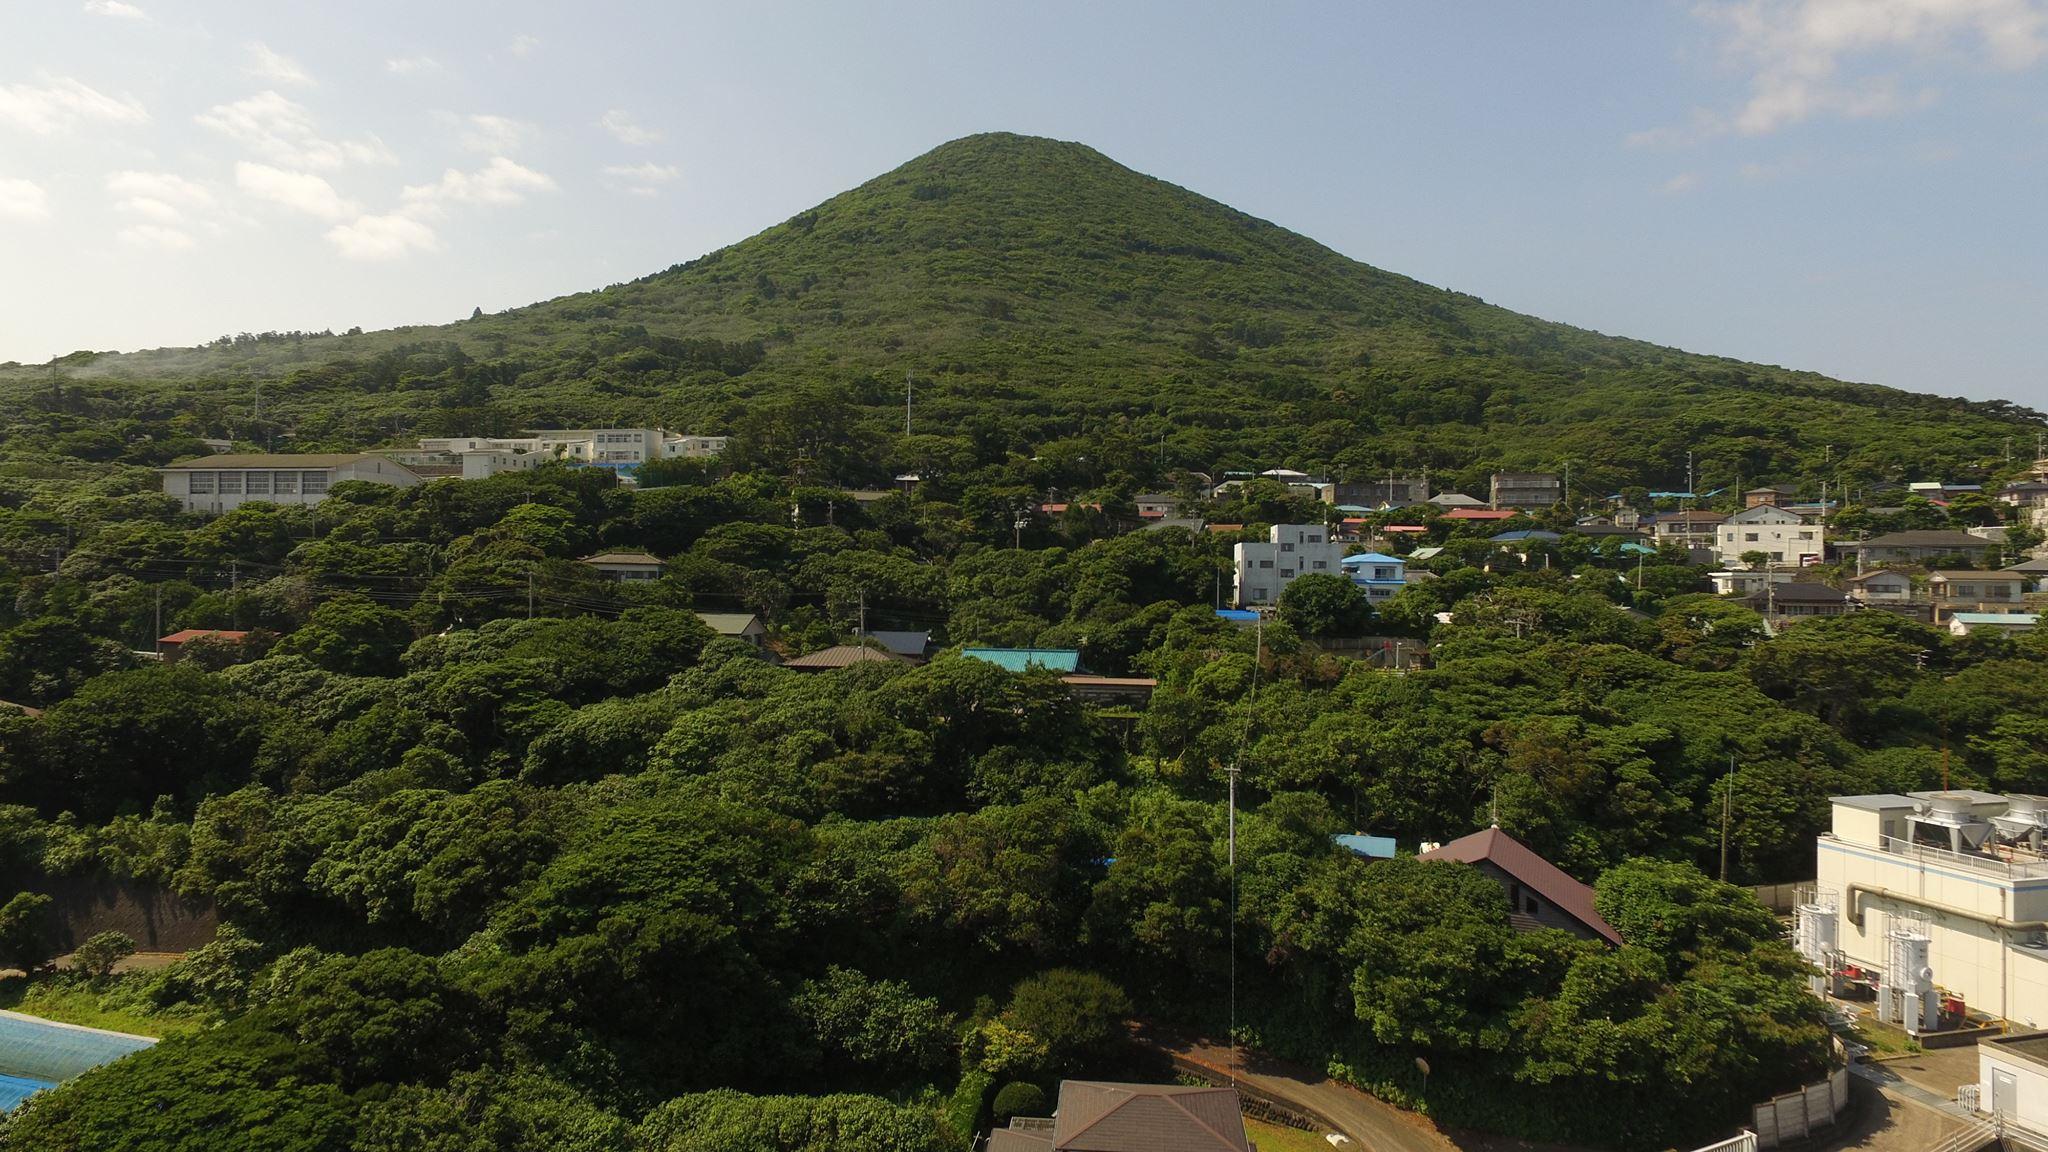 竹芝発 東海汽船(ジェット船) 利島  最大4ダイブ付 3日間8